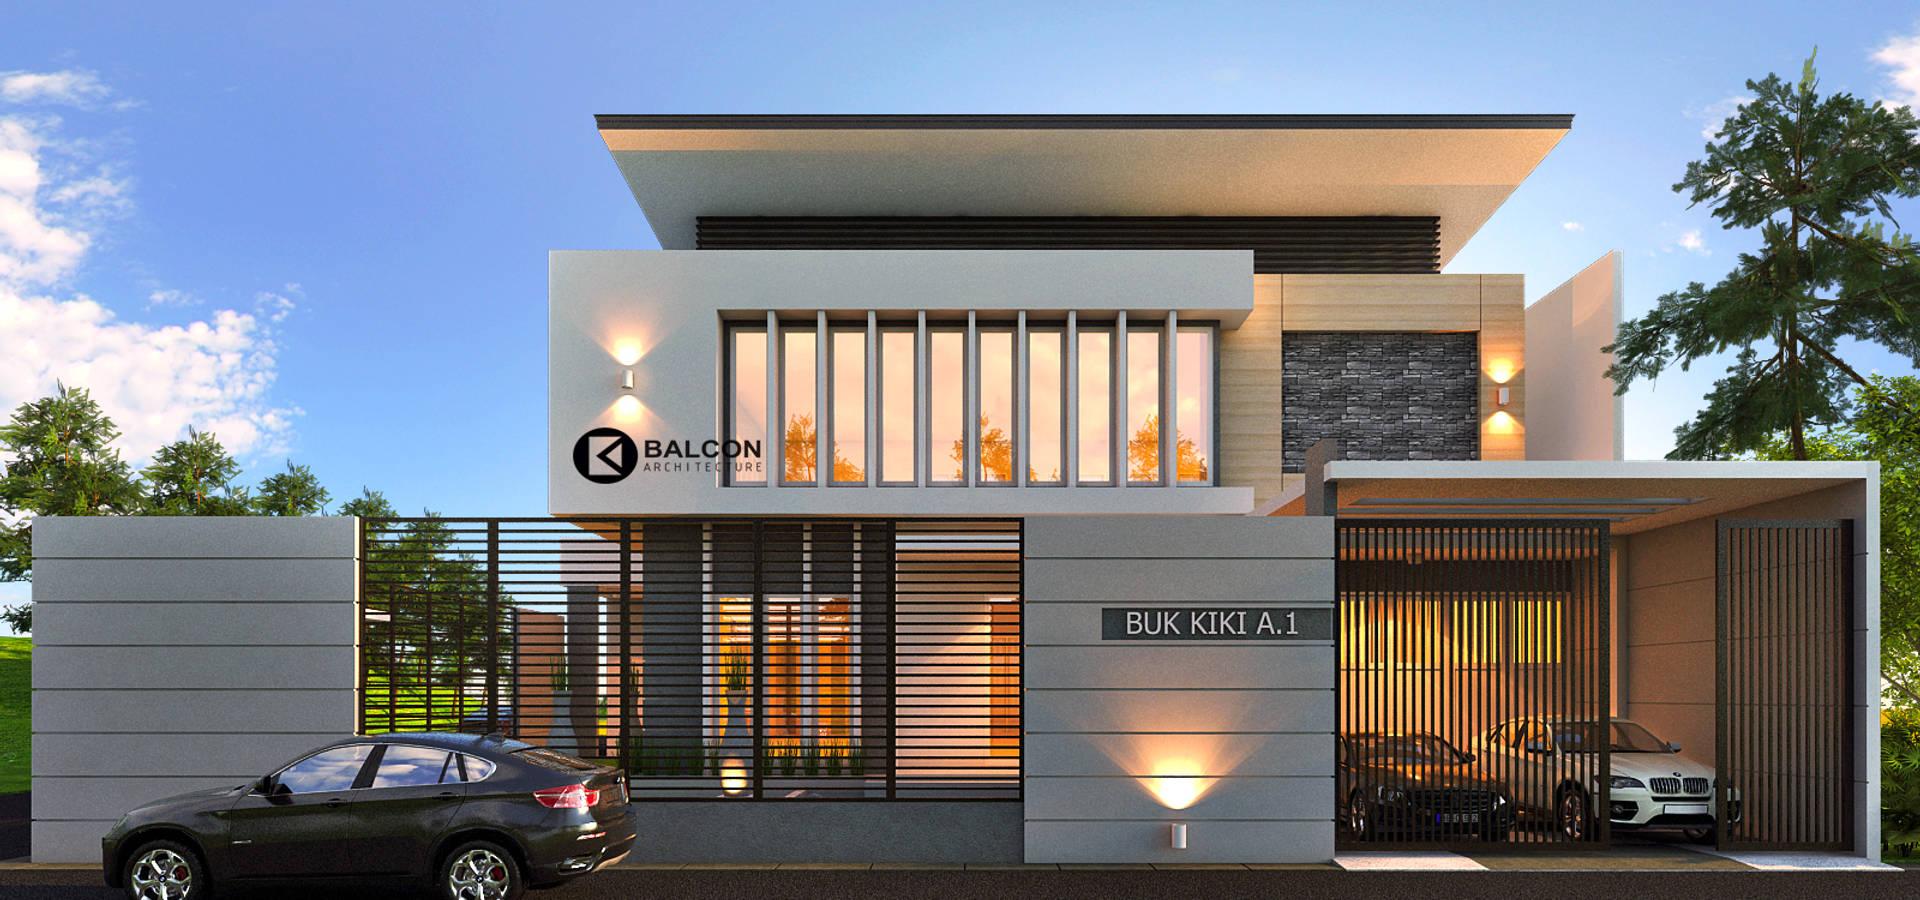 BALCON ARCHITECTS